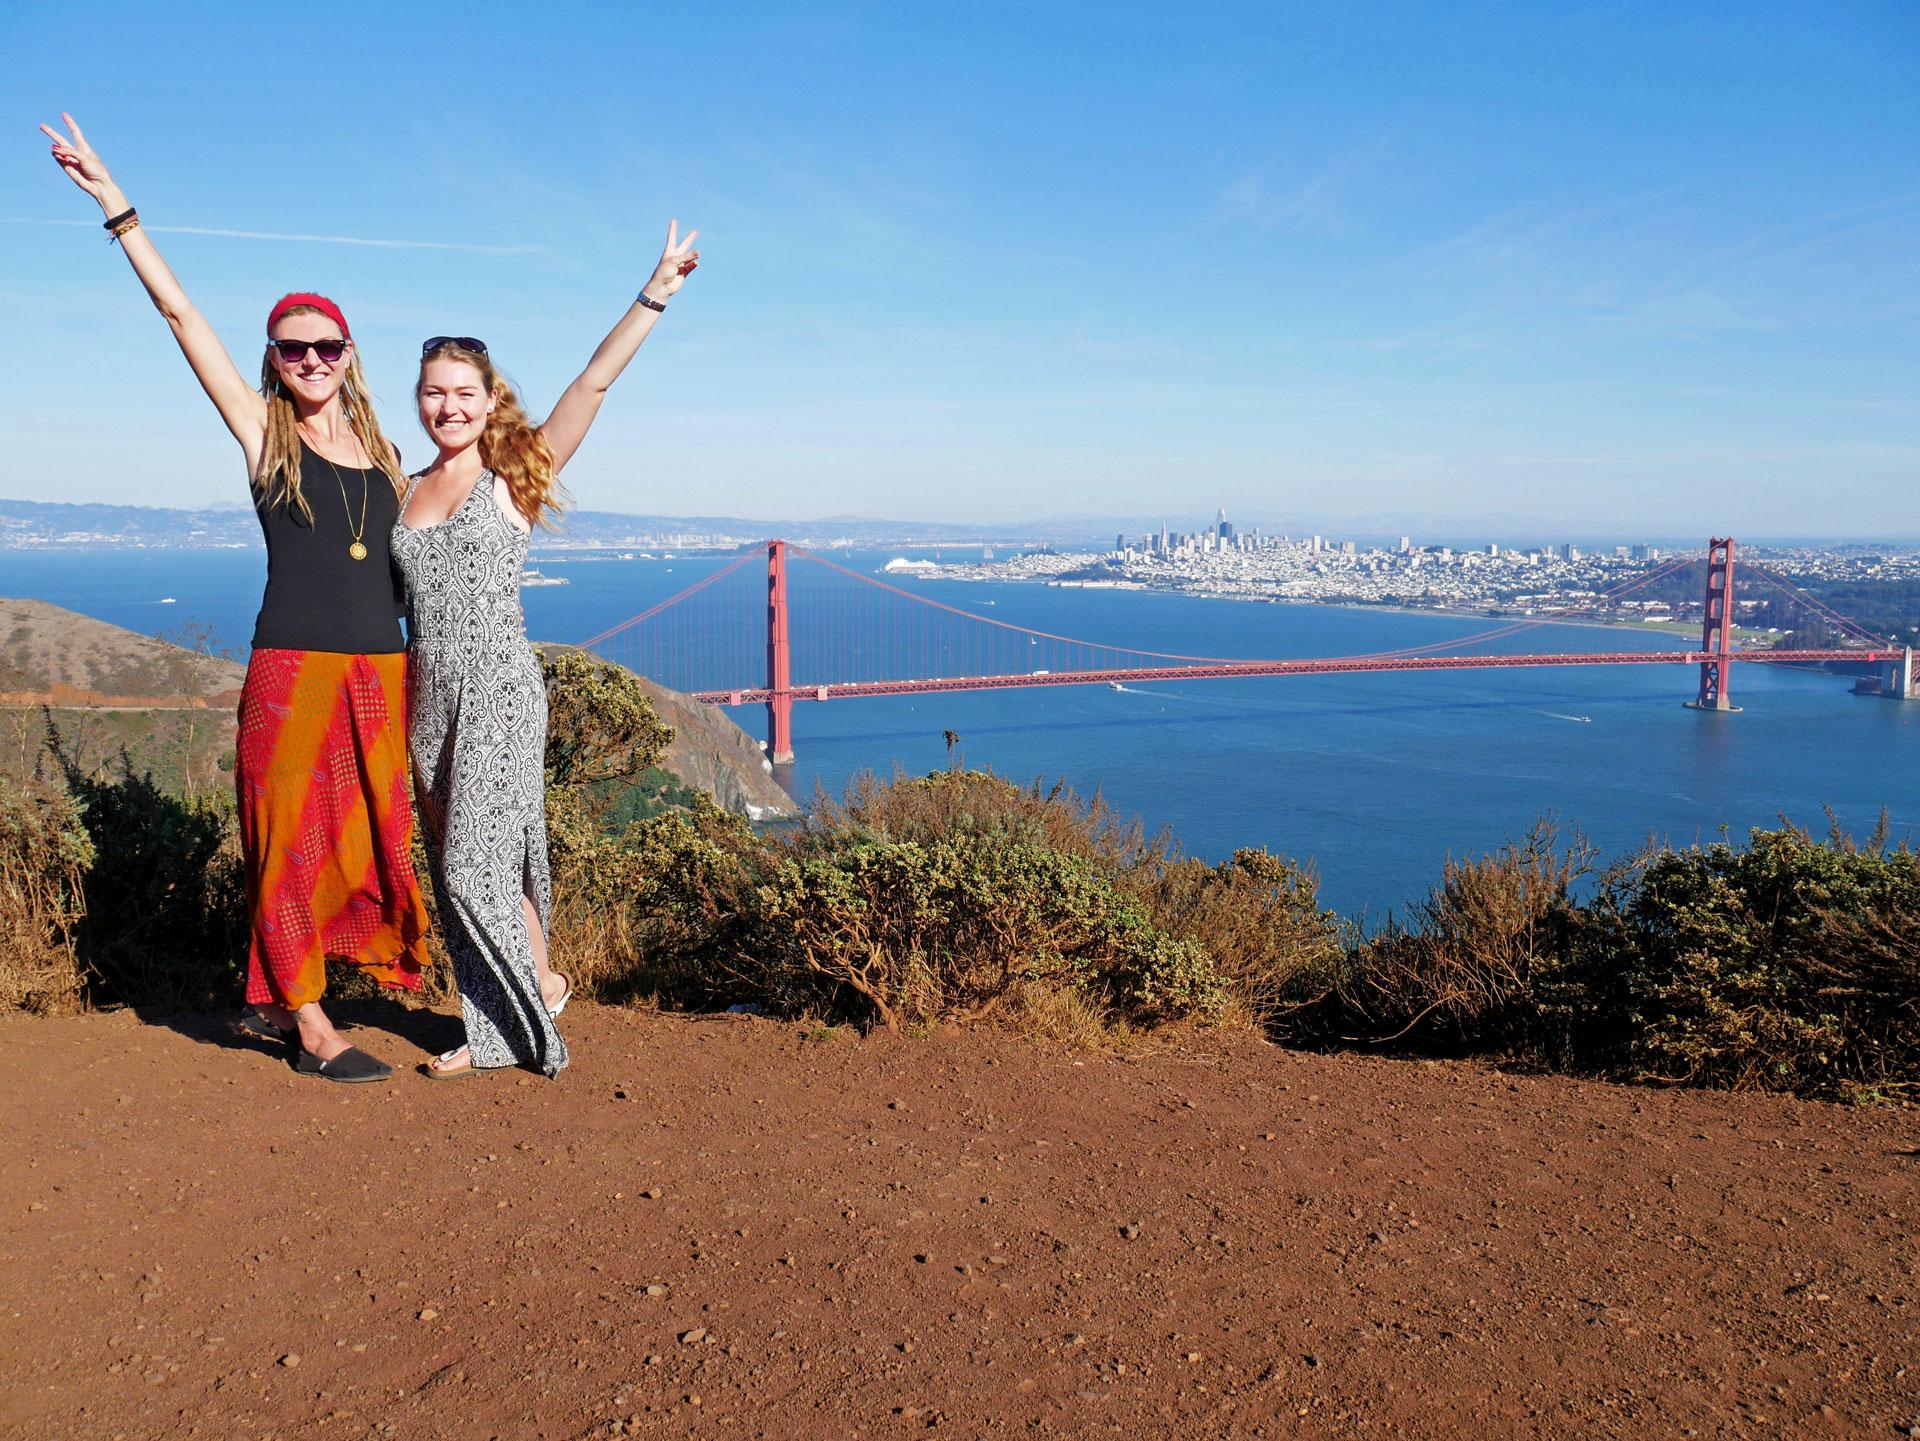 Sisters at Marin Headlands overlooking Golden Gate Bridge, city and San Francisco Bay